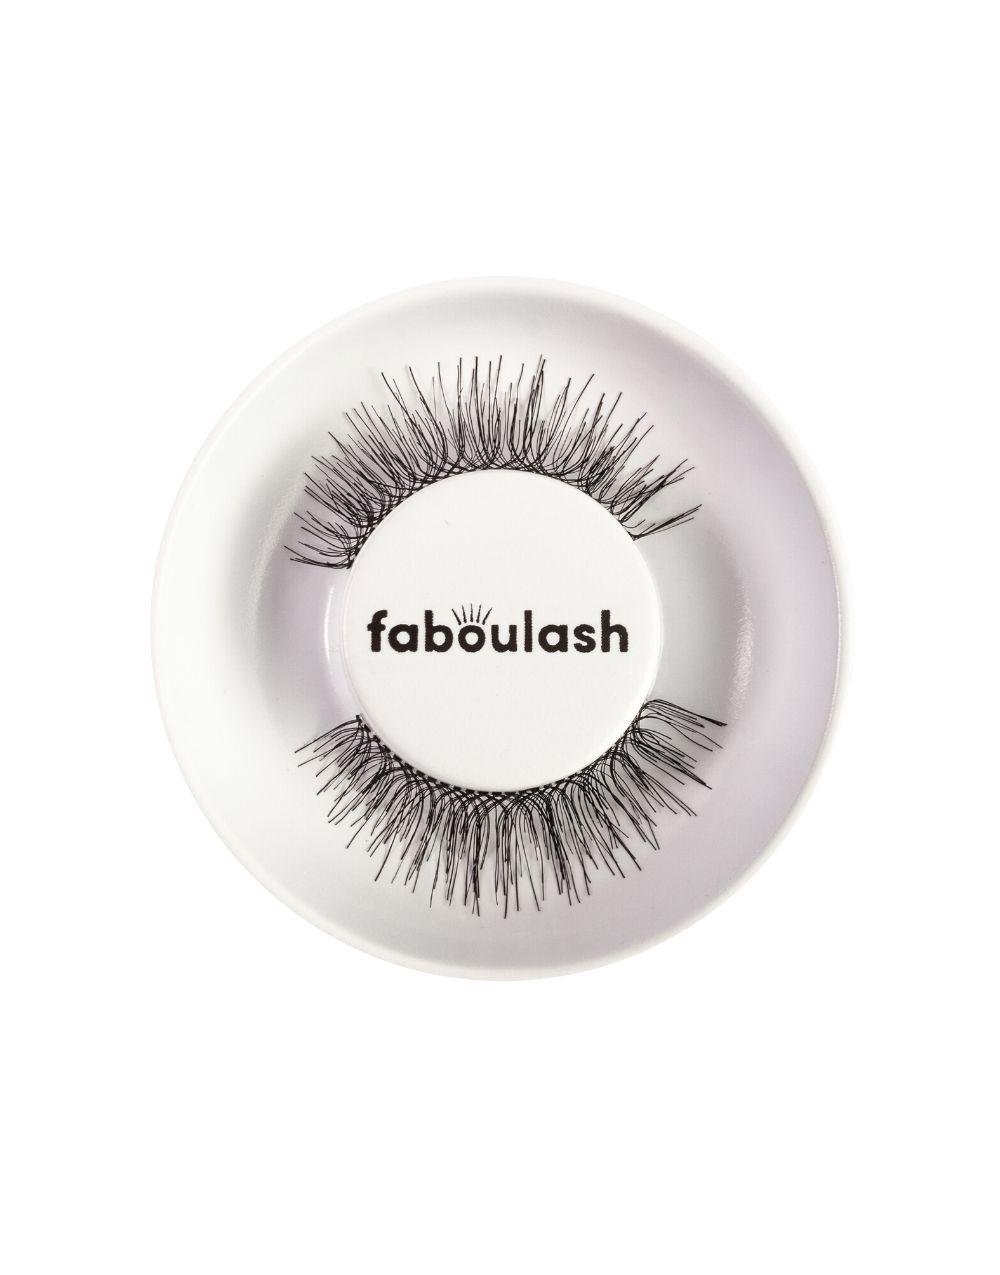 Faboulash 314 by Faboulash